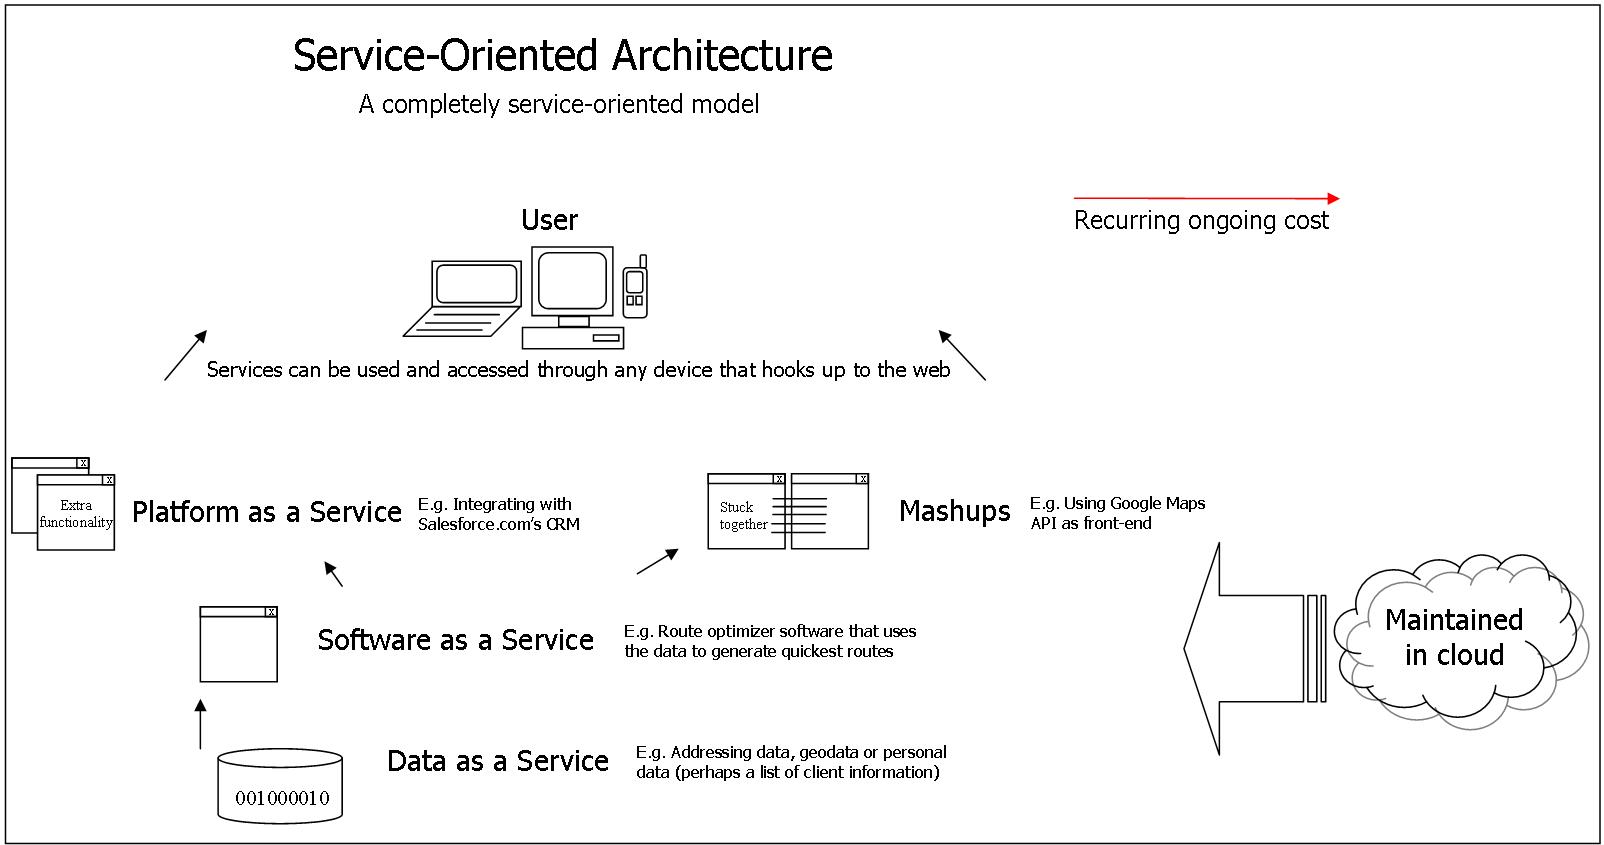 Soa detailed diagram web service wikipedia the free soa detailed diagram web service wikipedia the free encyclopedia ccuart Images